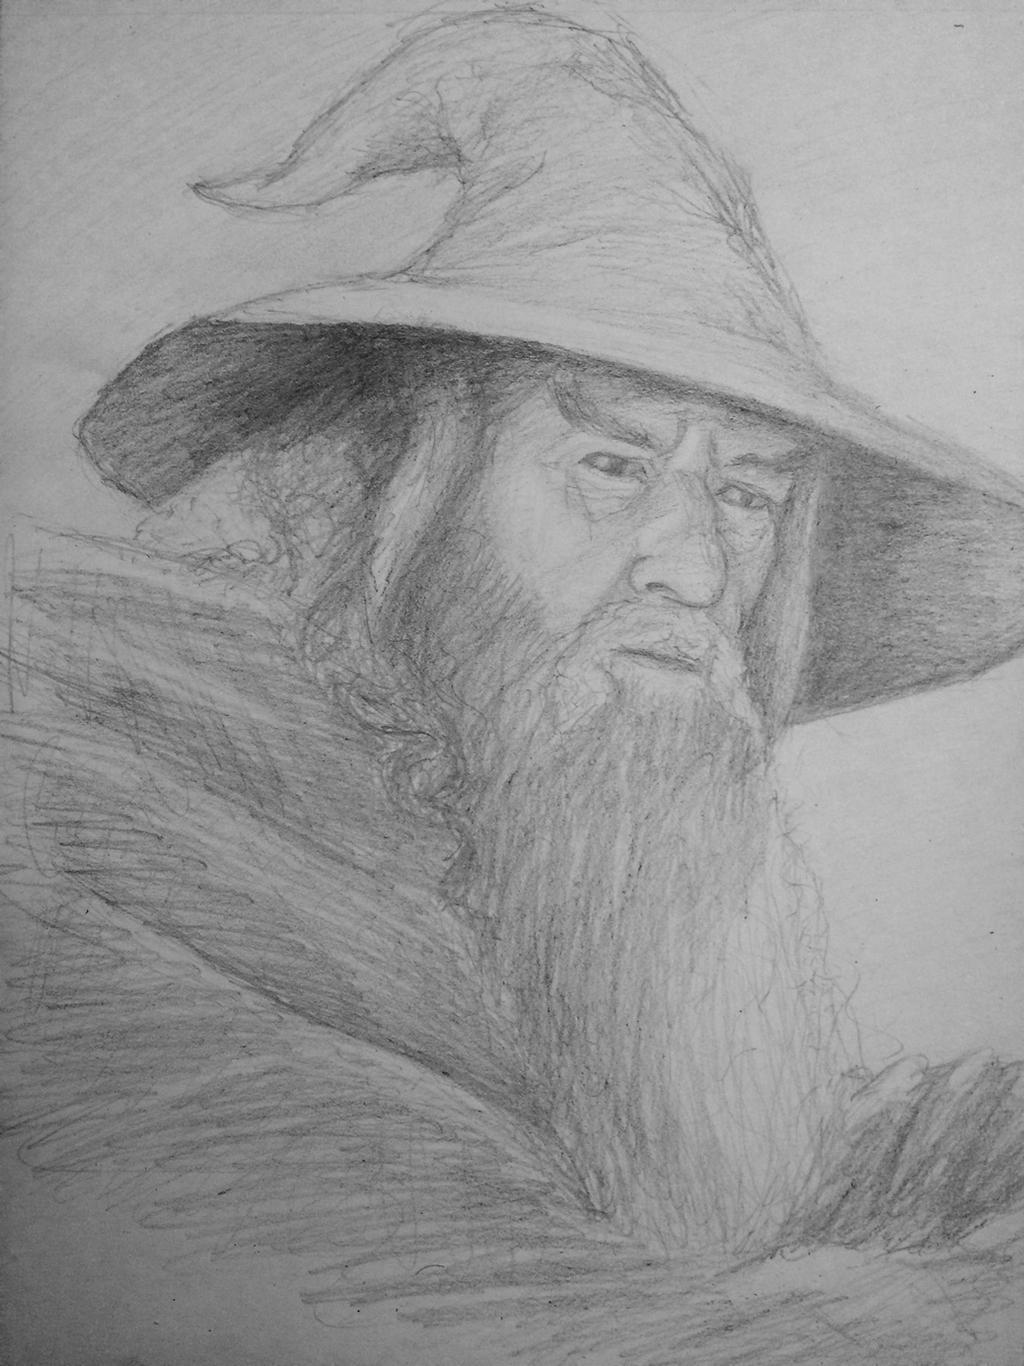 Gandalf the Grey by conhennelly